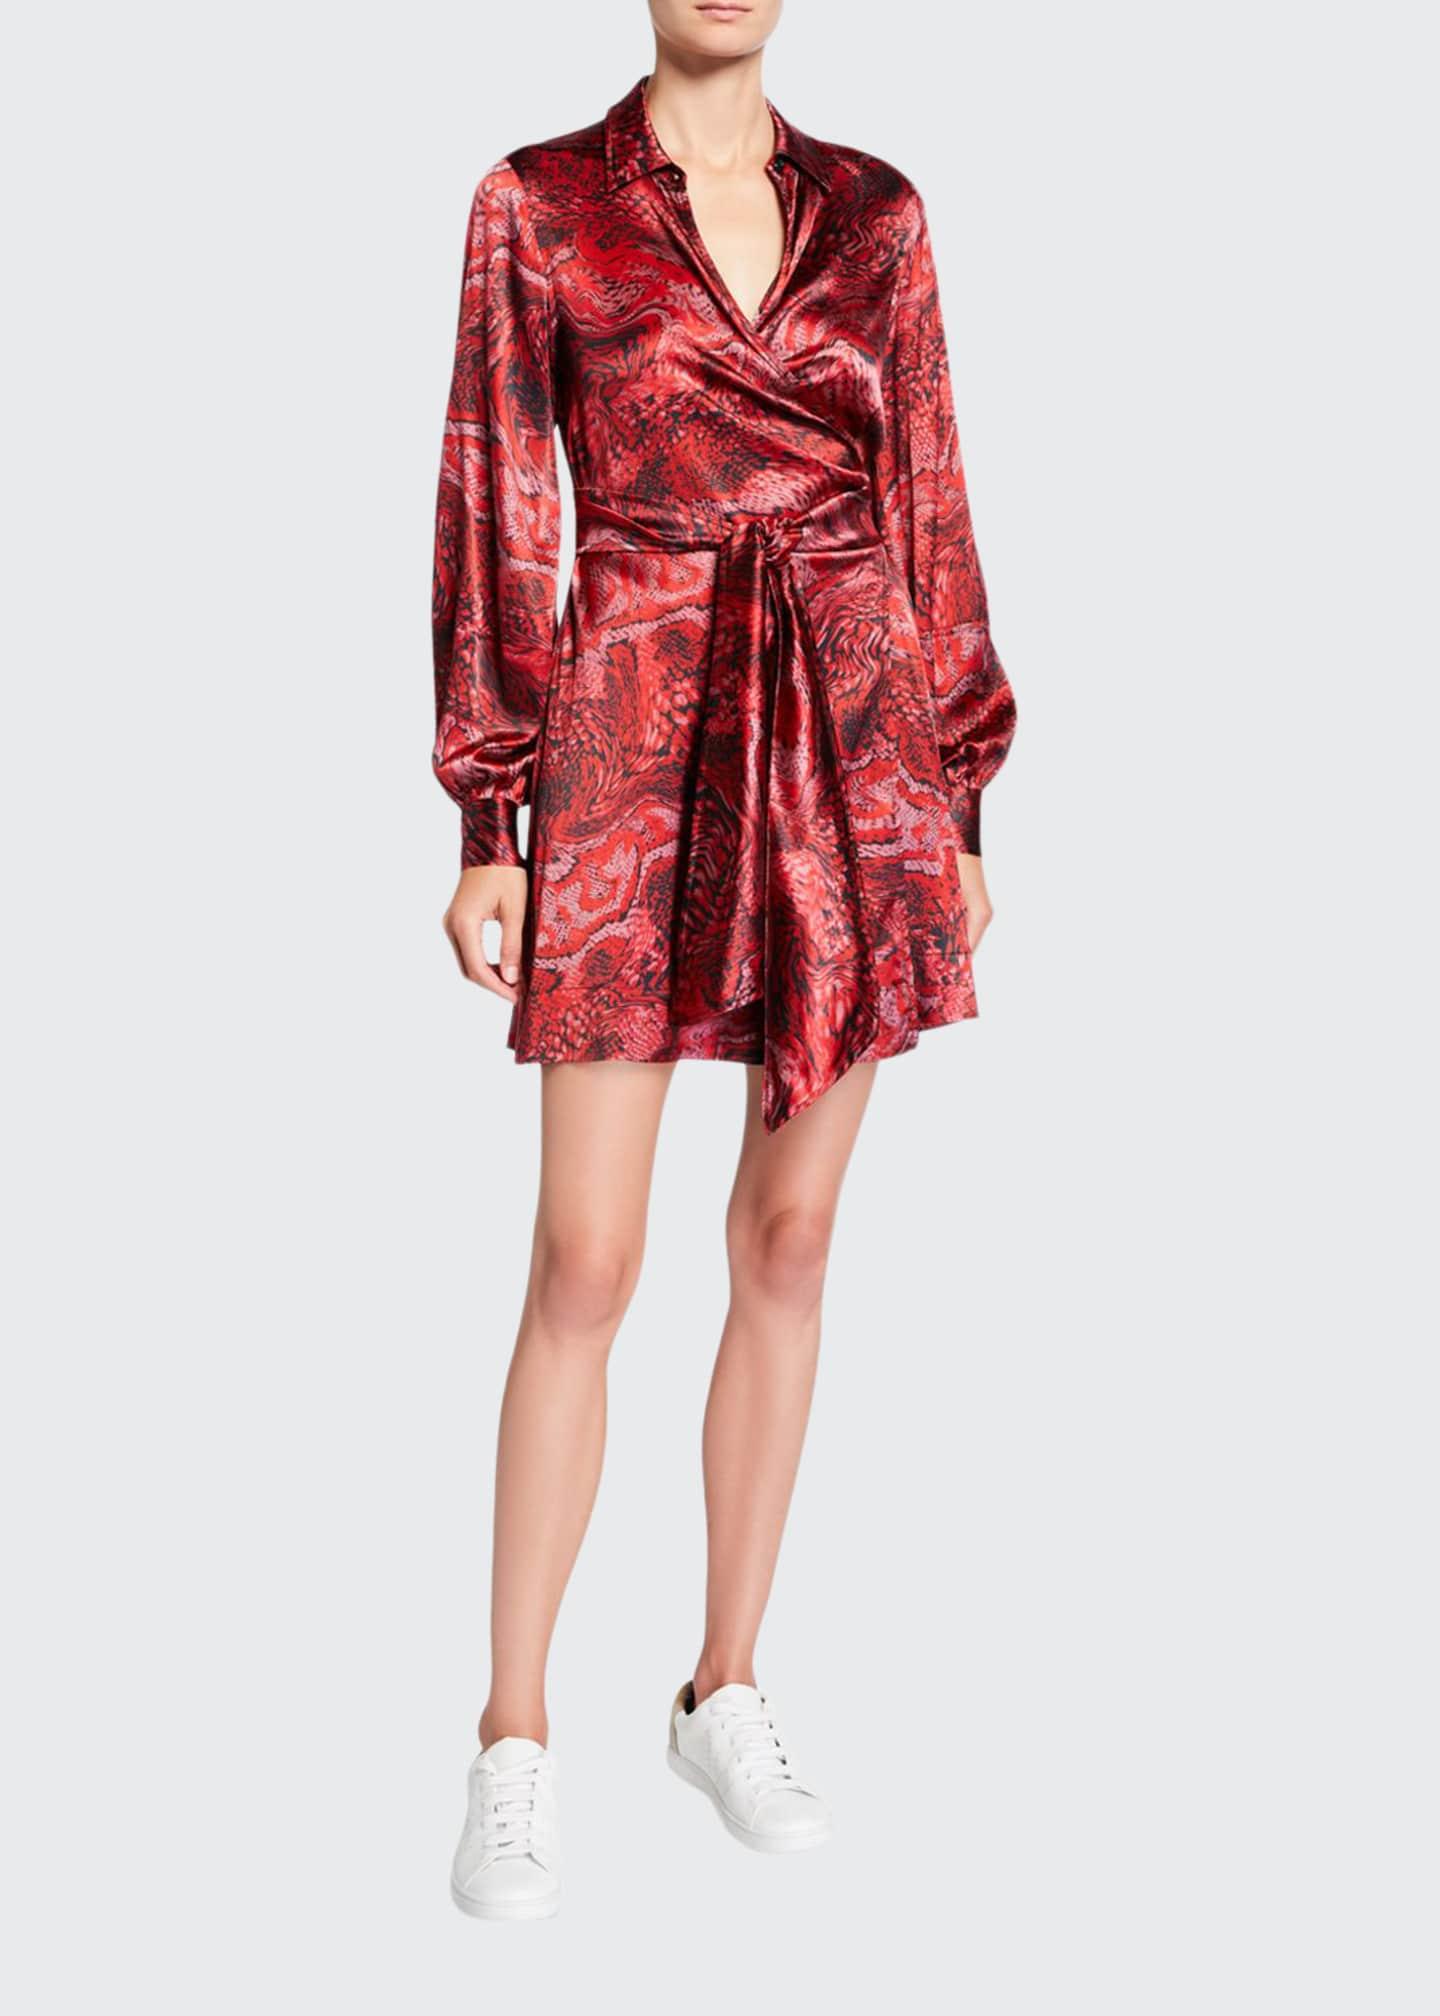 Ganni Printed Satin Long-Sleeve Wrap Dress